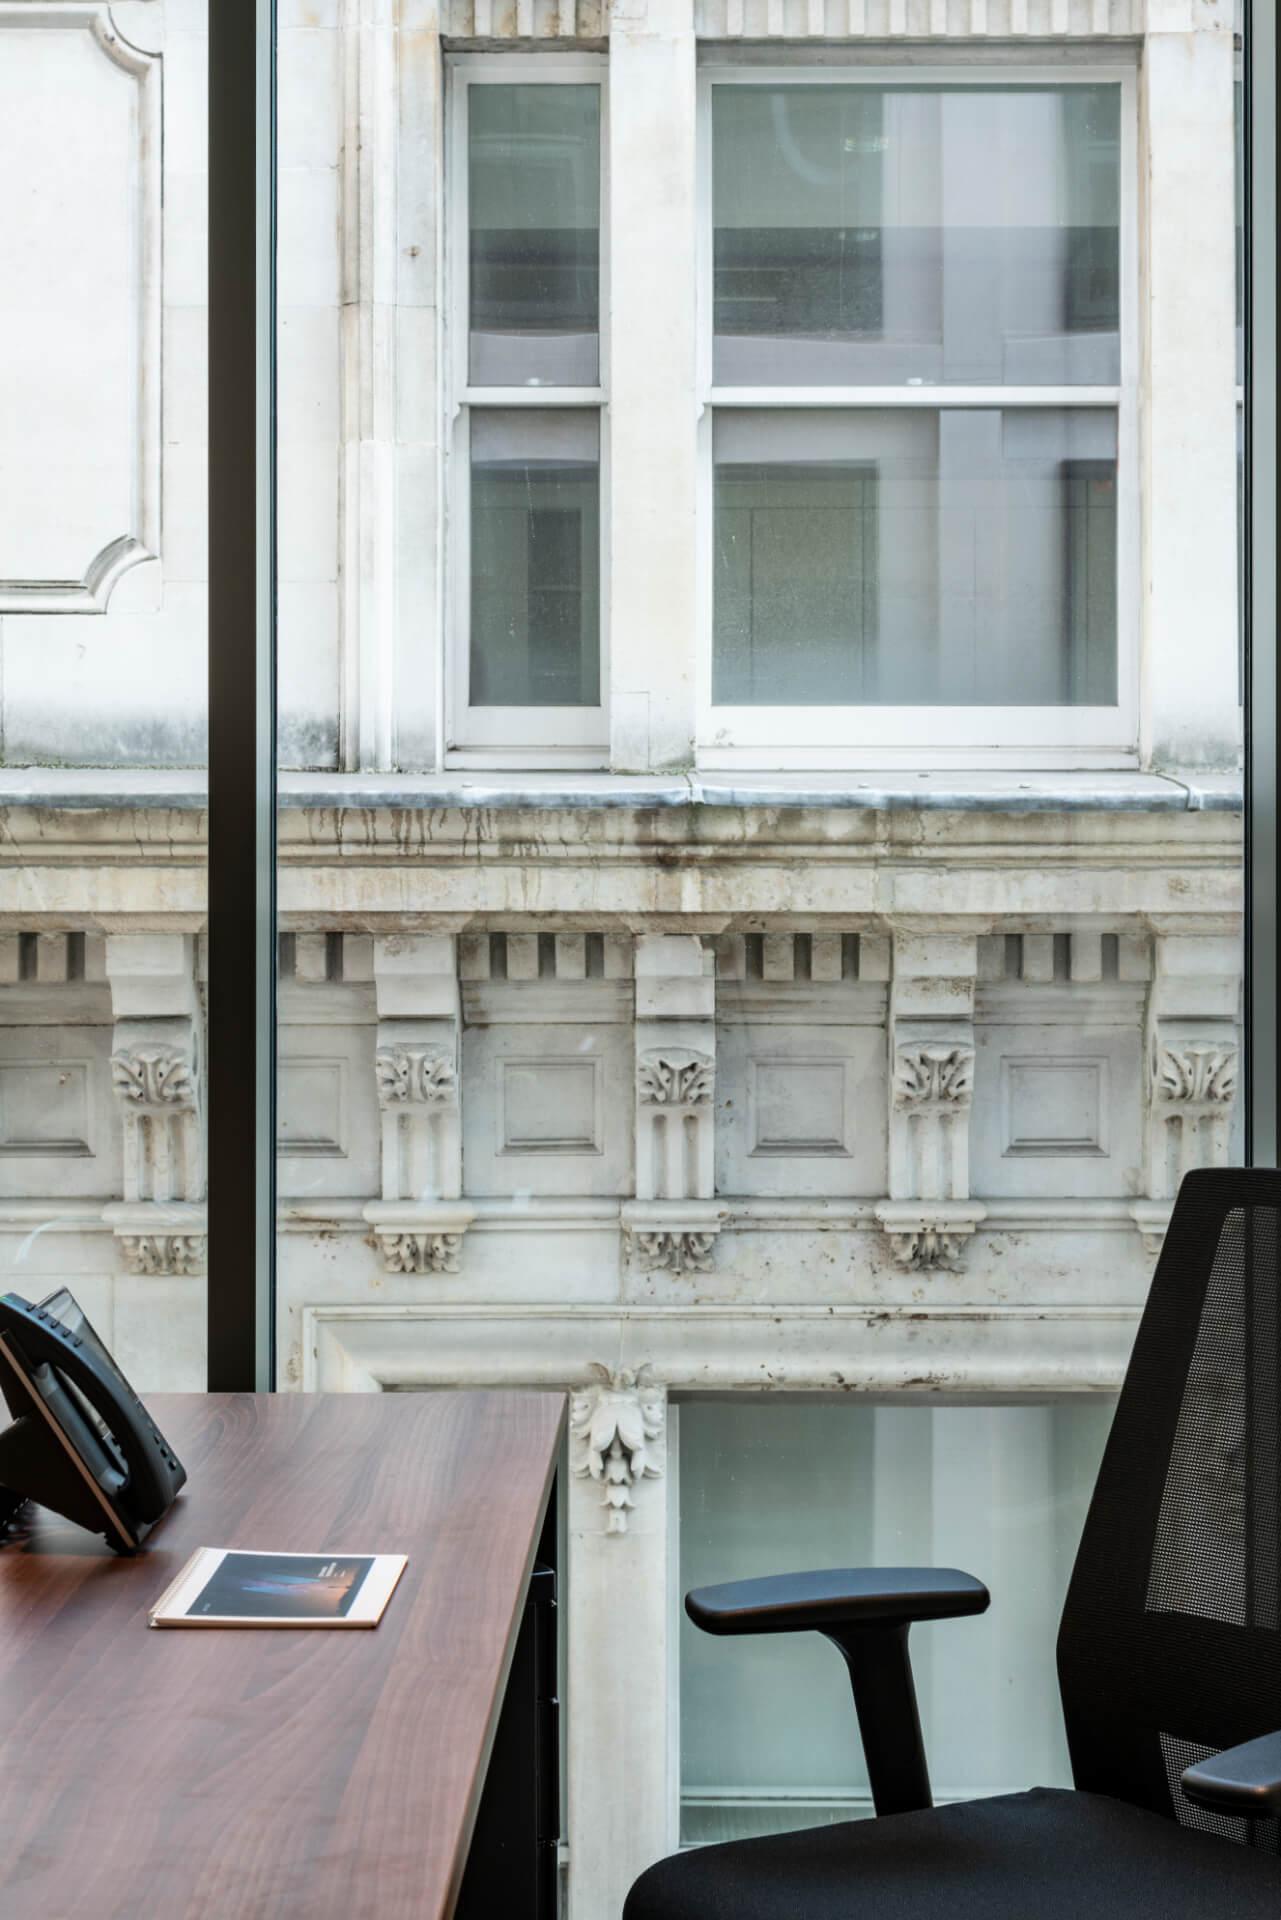 Avior Office View